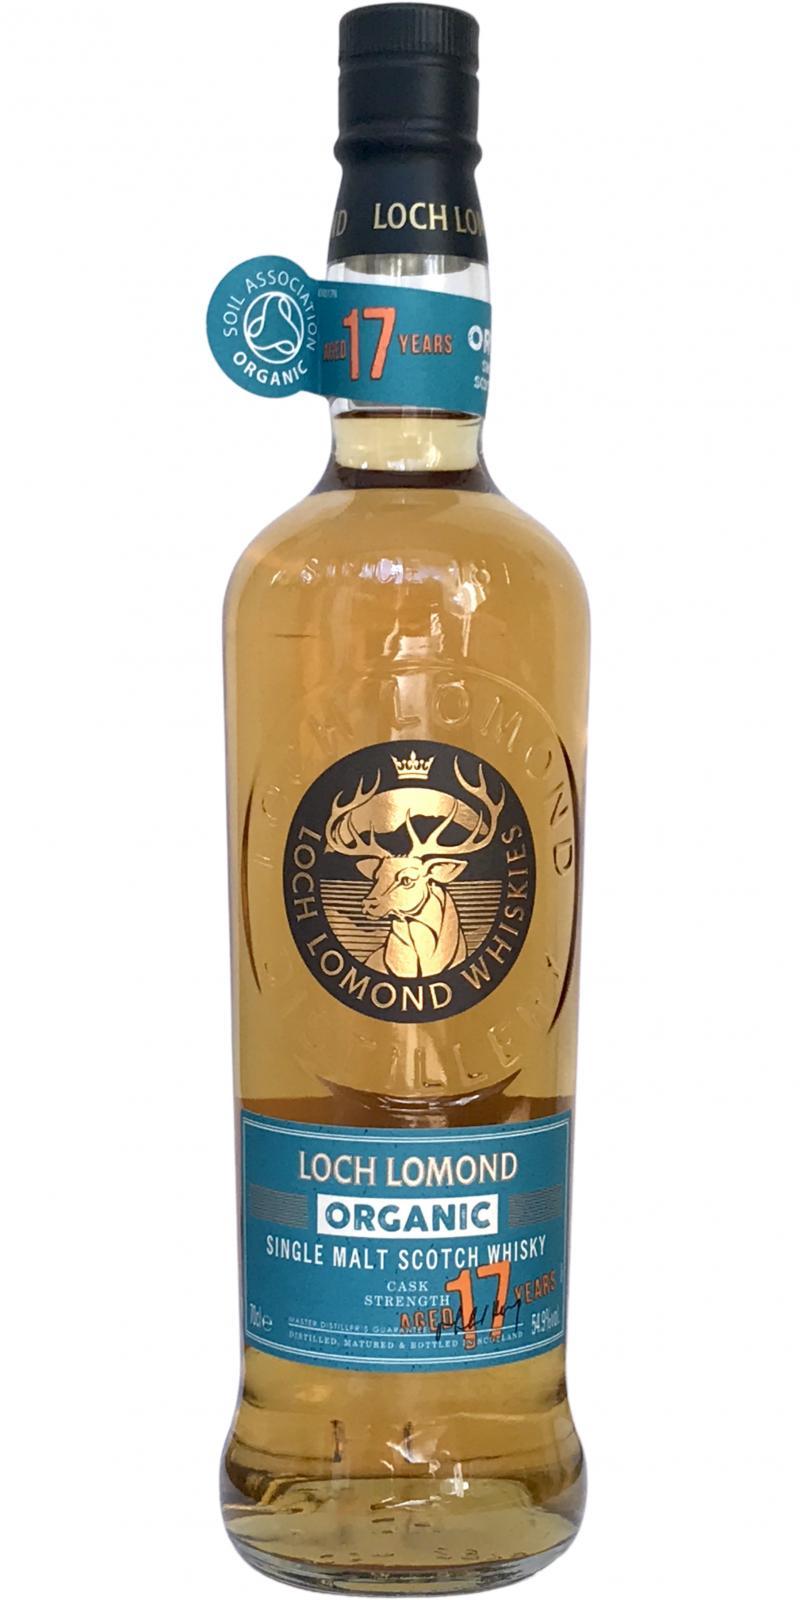 Loch Lomond 17-year-old